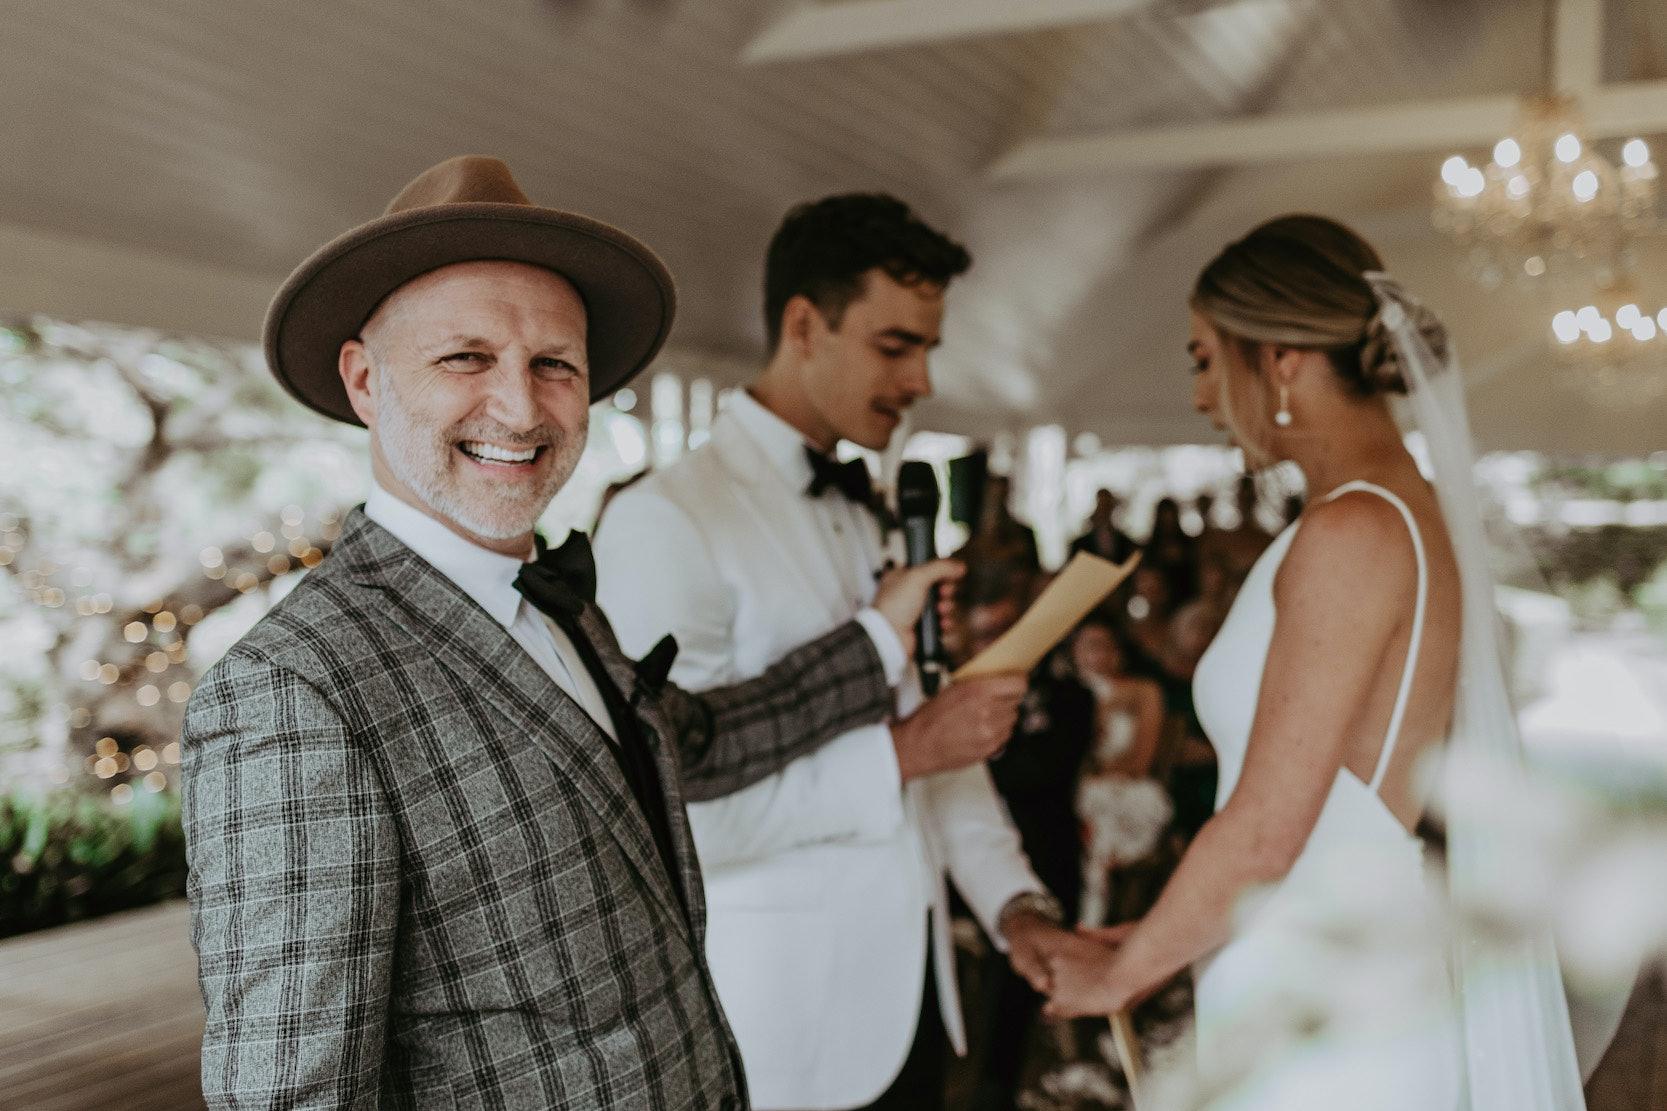 Wedding celebrant smiling at camera